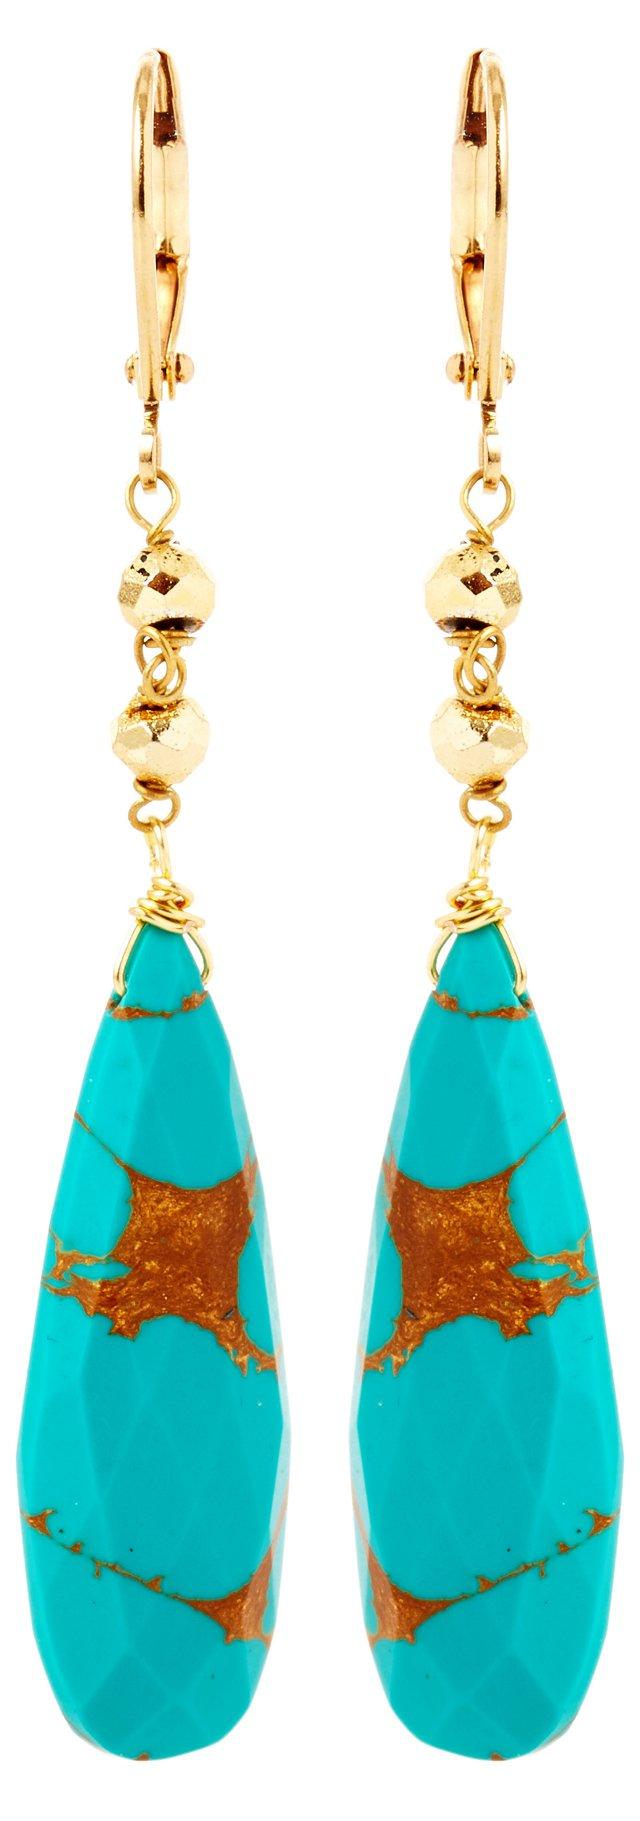 Turquoise Dagger w/ Pyrite Earrings